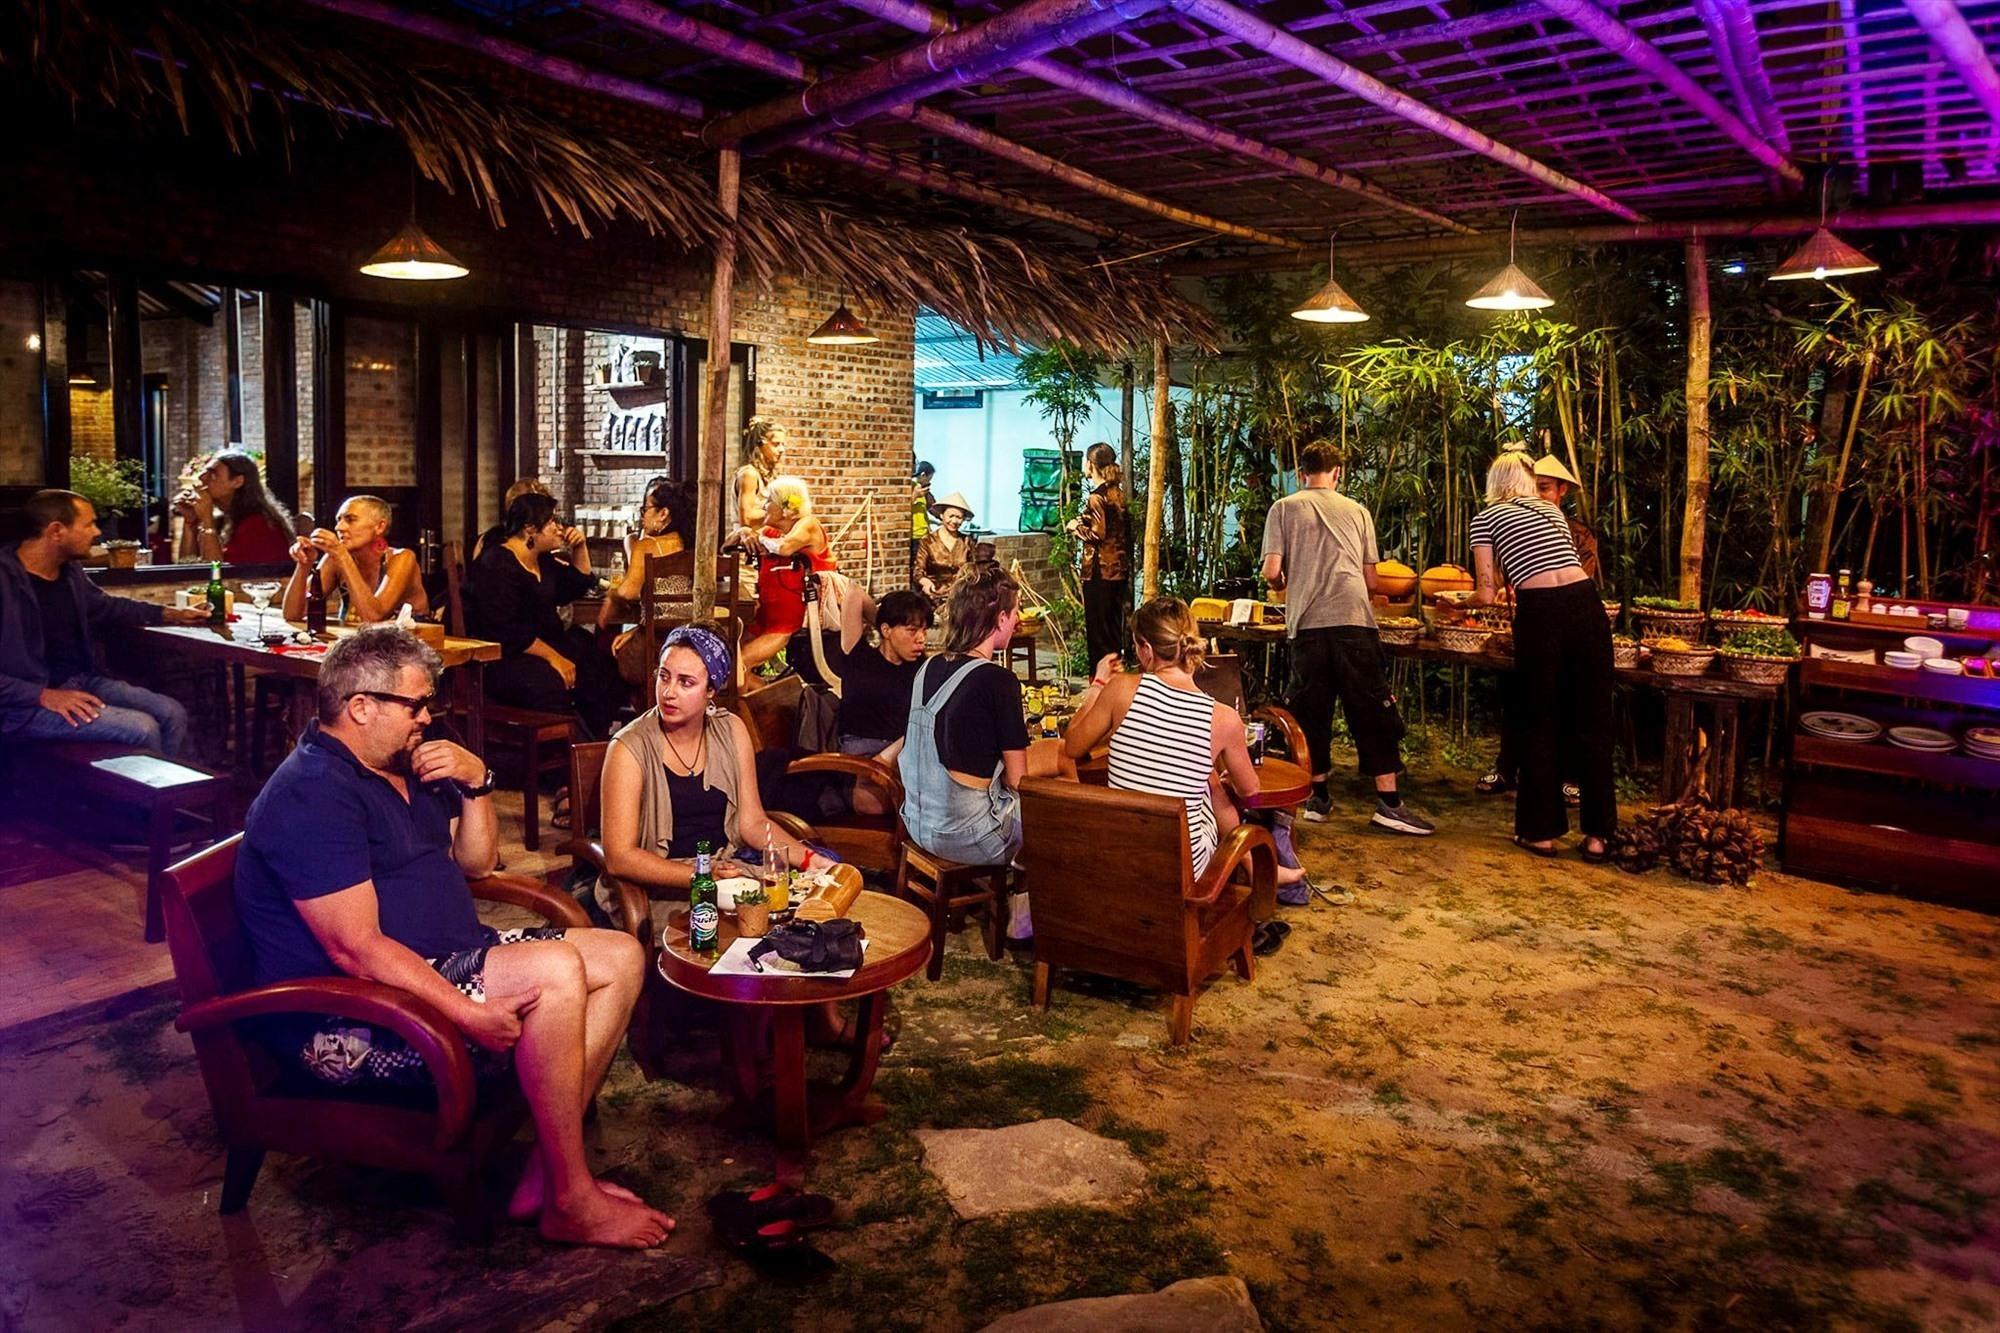 Veggie Hut restaurant at night